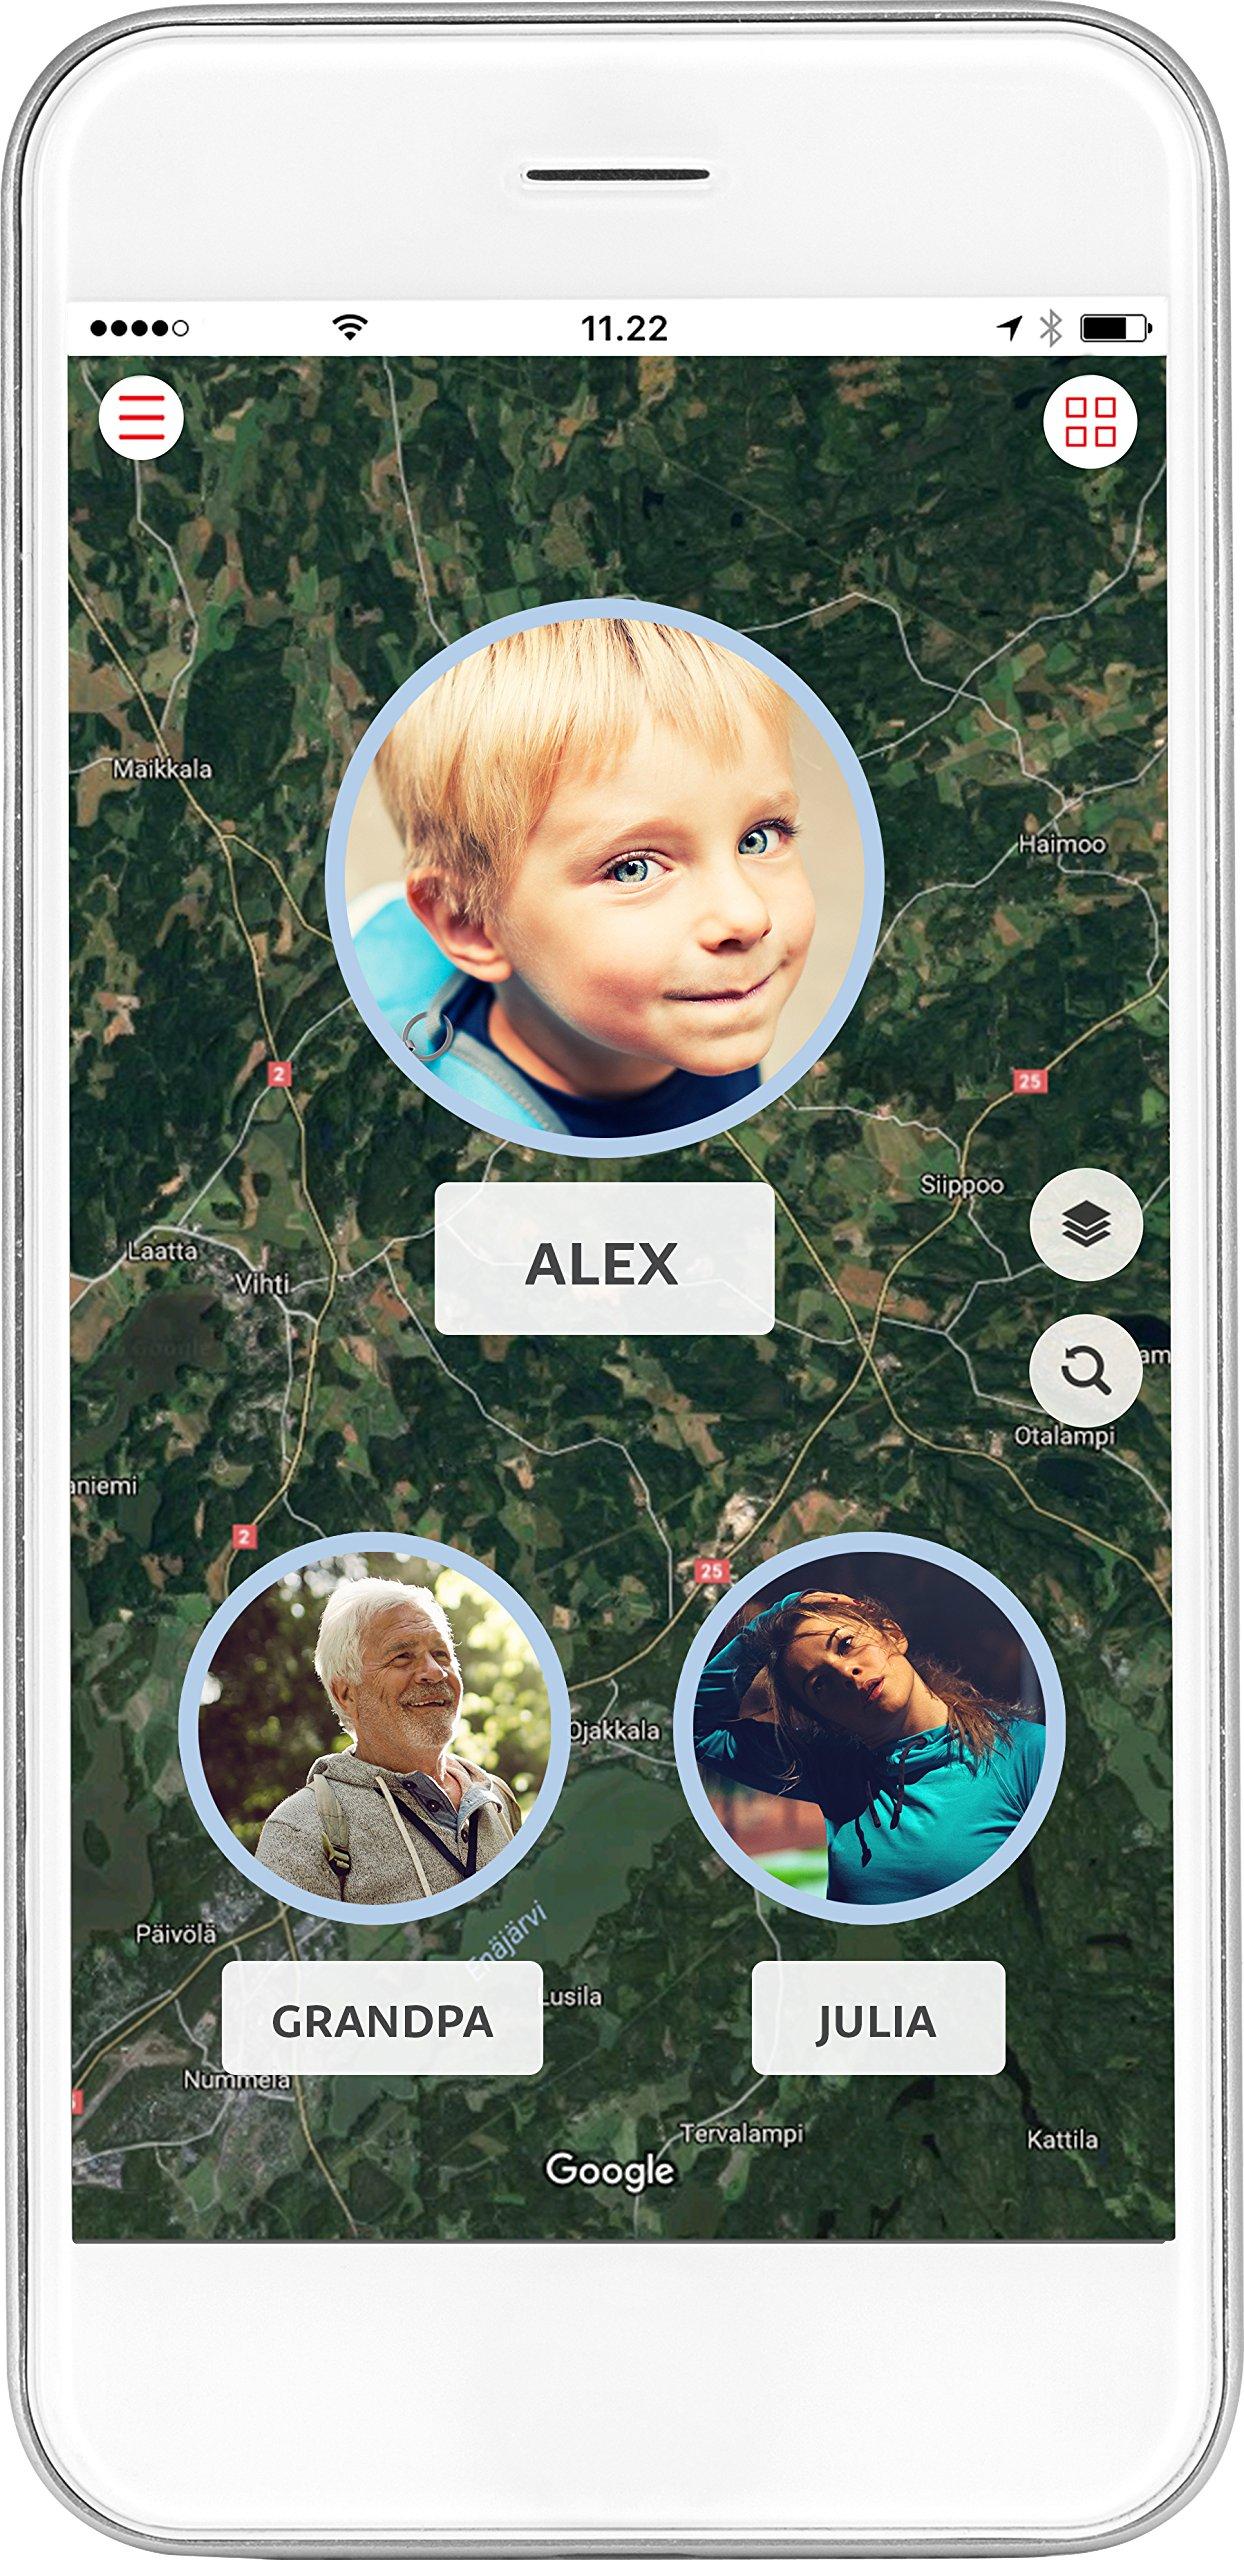 Yepzon Freedom | Most Advanced 3G + WiFi + GPS Locator with Personal Alarm by Yepzon (Image #2)